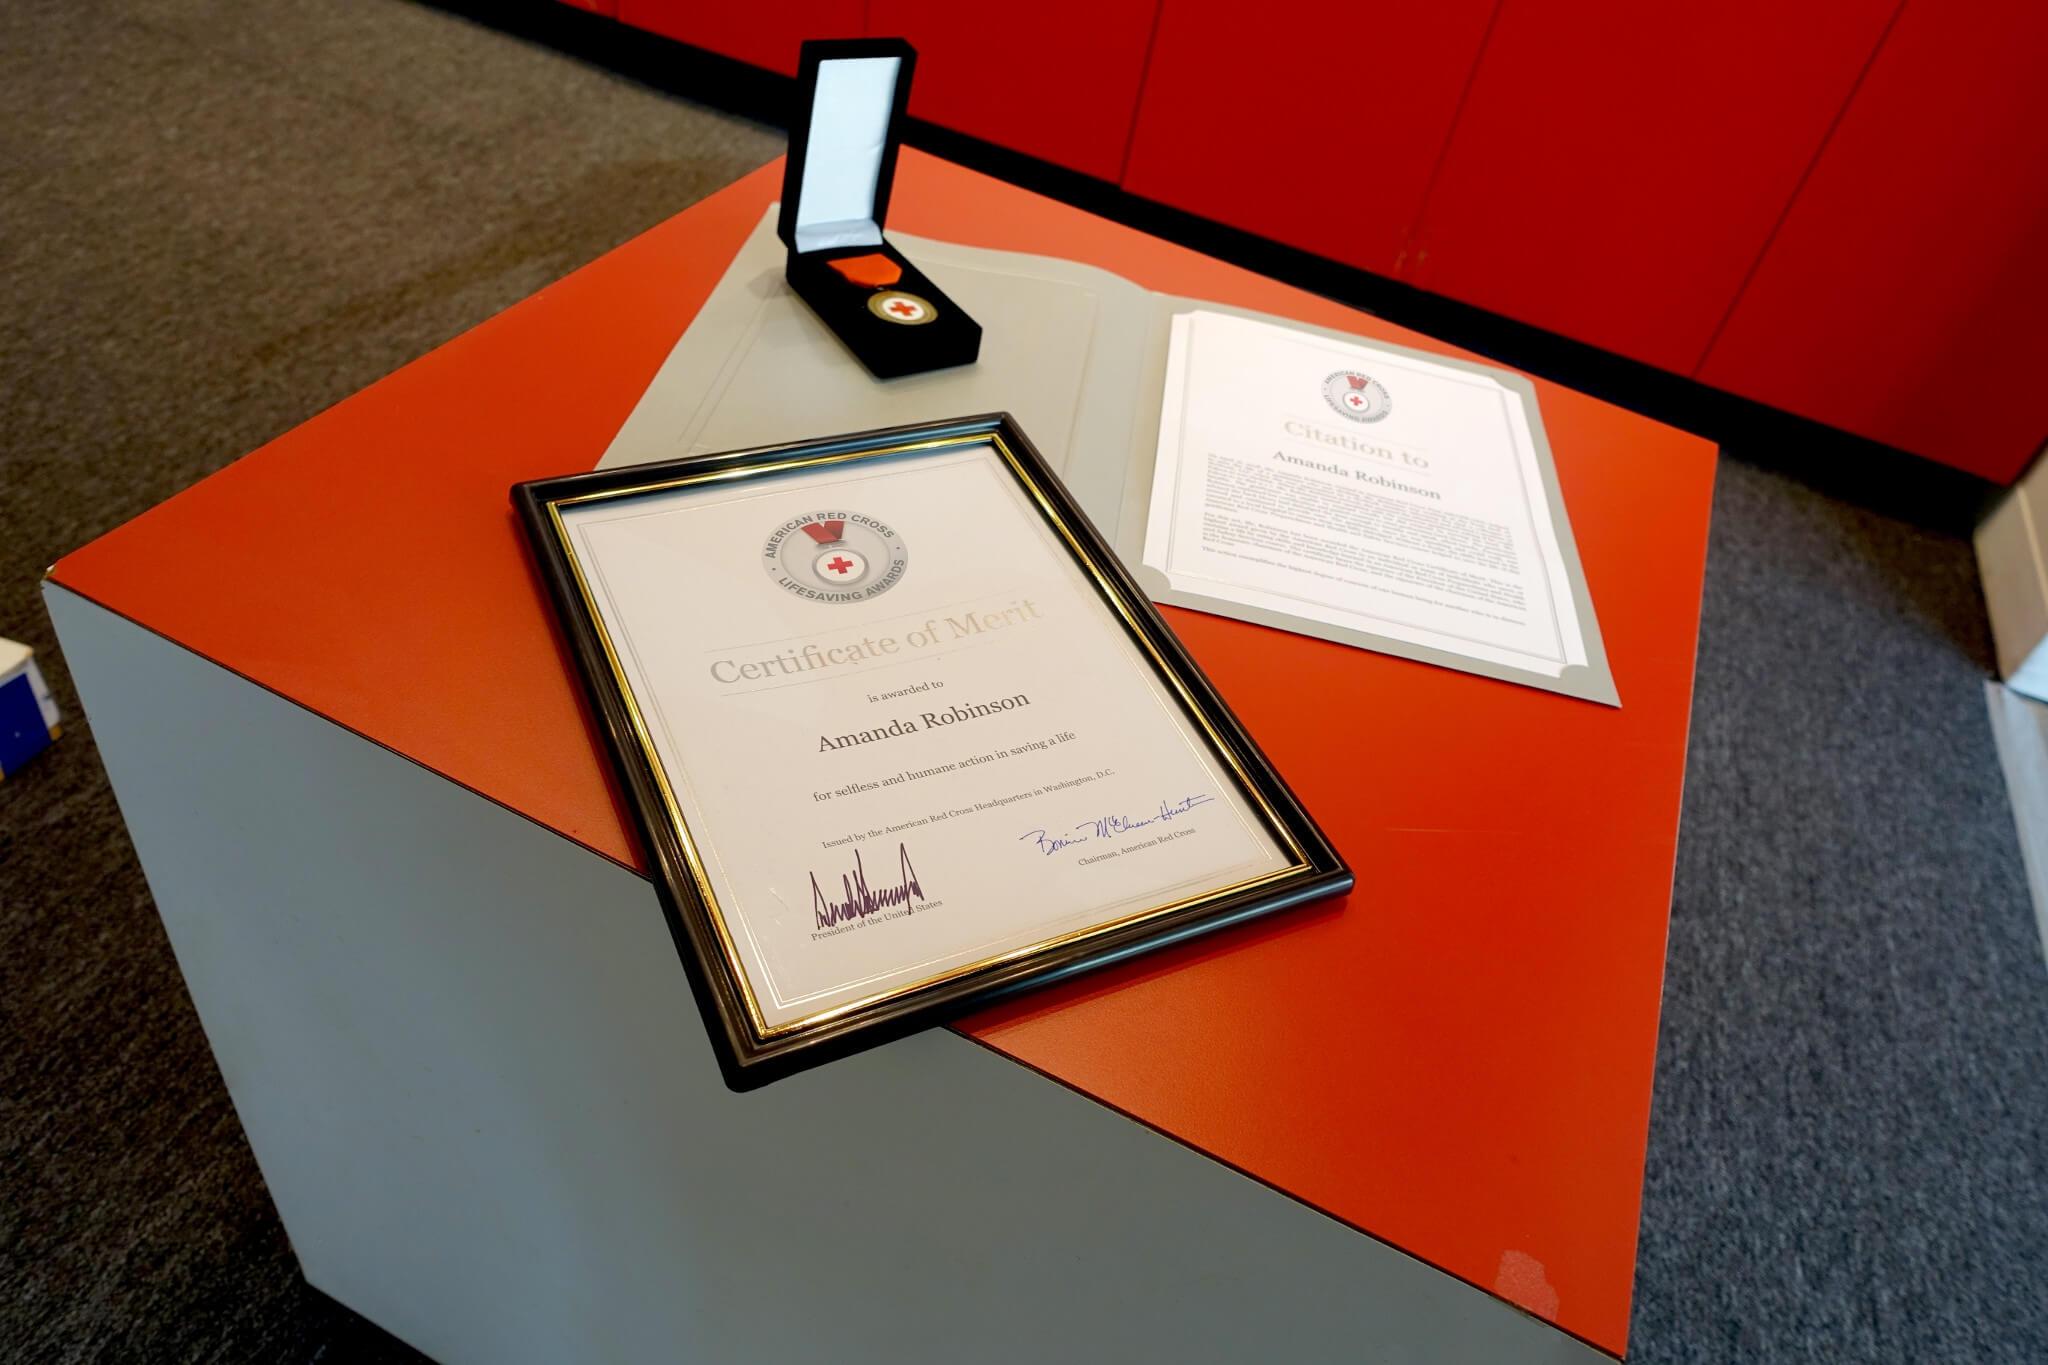 American Red Cross Lifesaving Awards Program | Red Cross for Life Saving Award Certificate Template